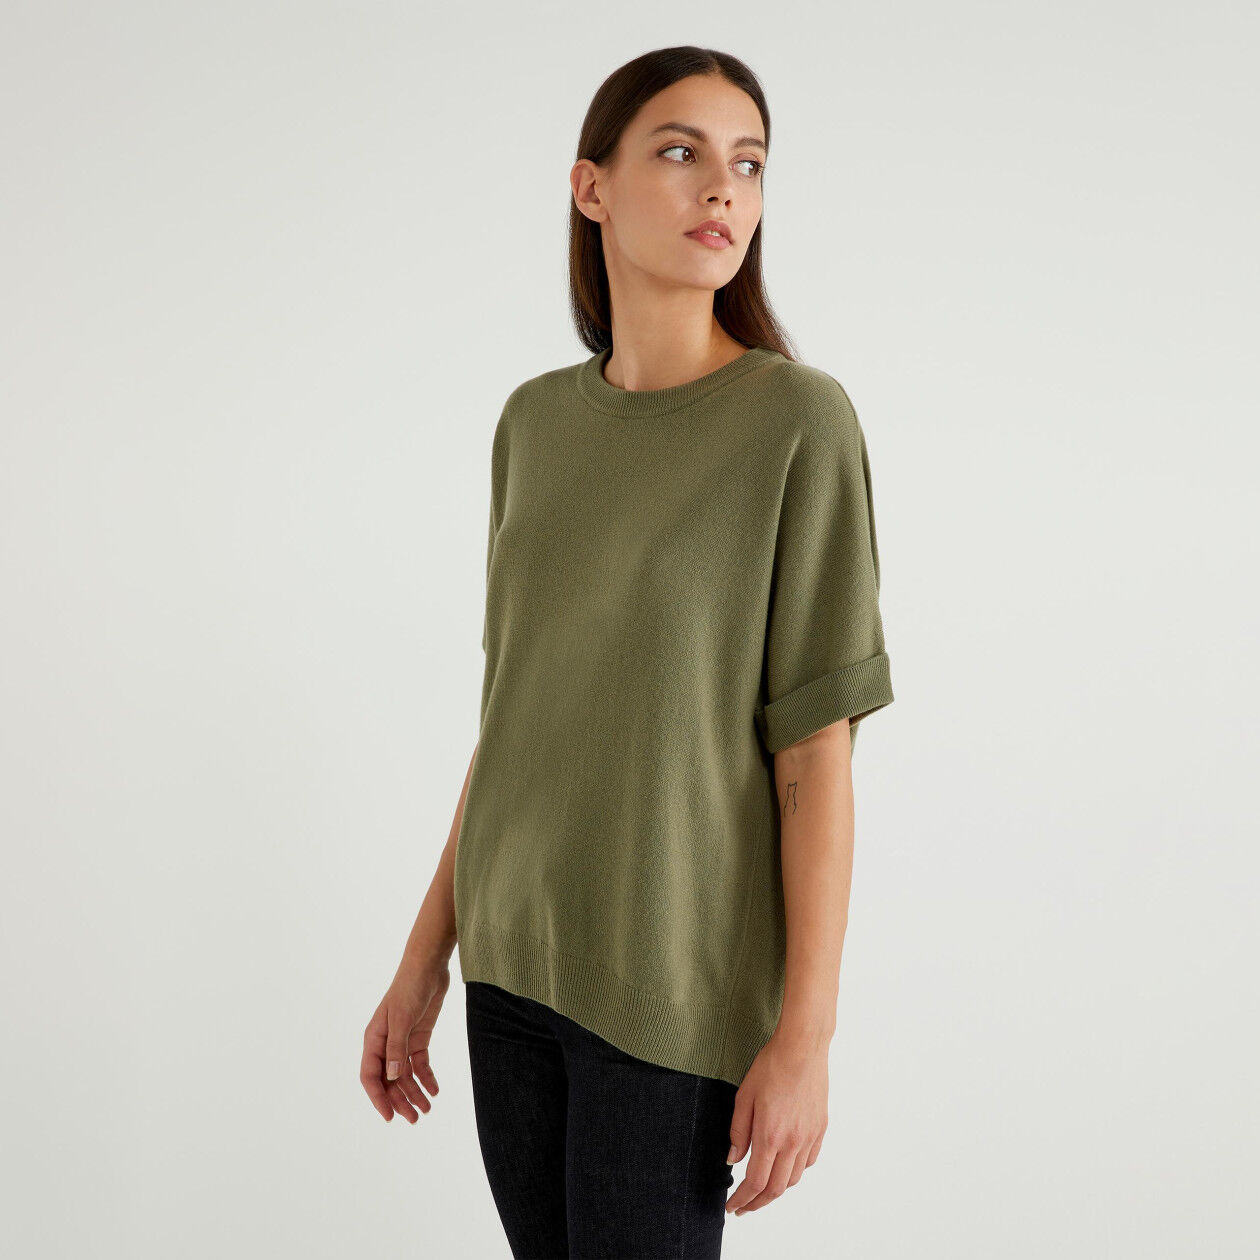 Jersey de manga corta de lana mixta